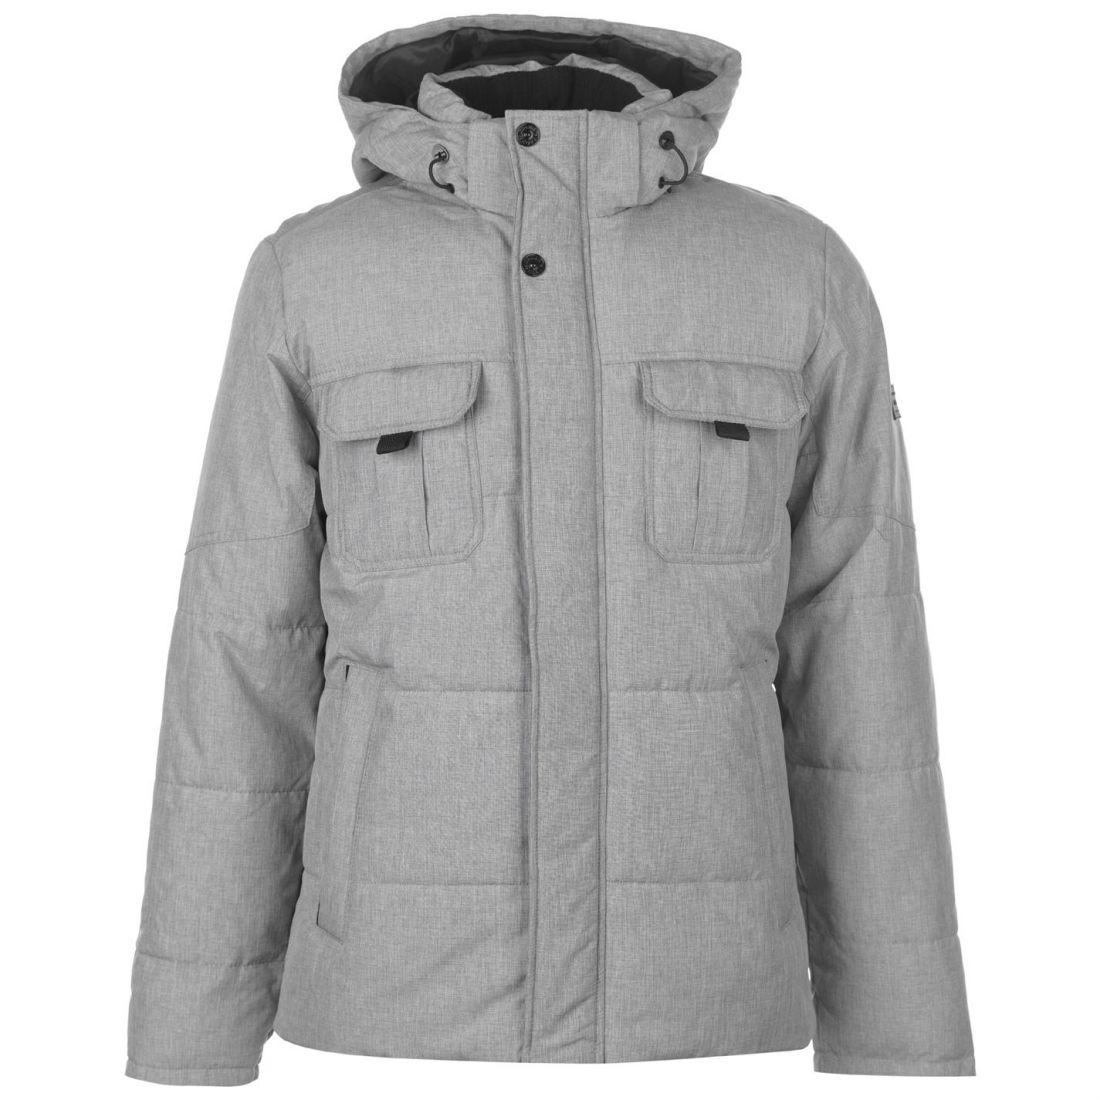 Mens Puffer Jacket JACK /& JONES Zoom Lightly Padded Funnel Neck  Zip Up Coat